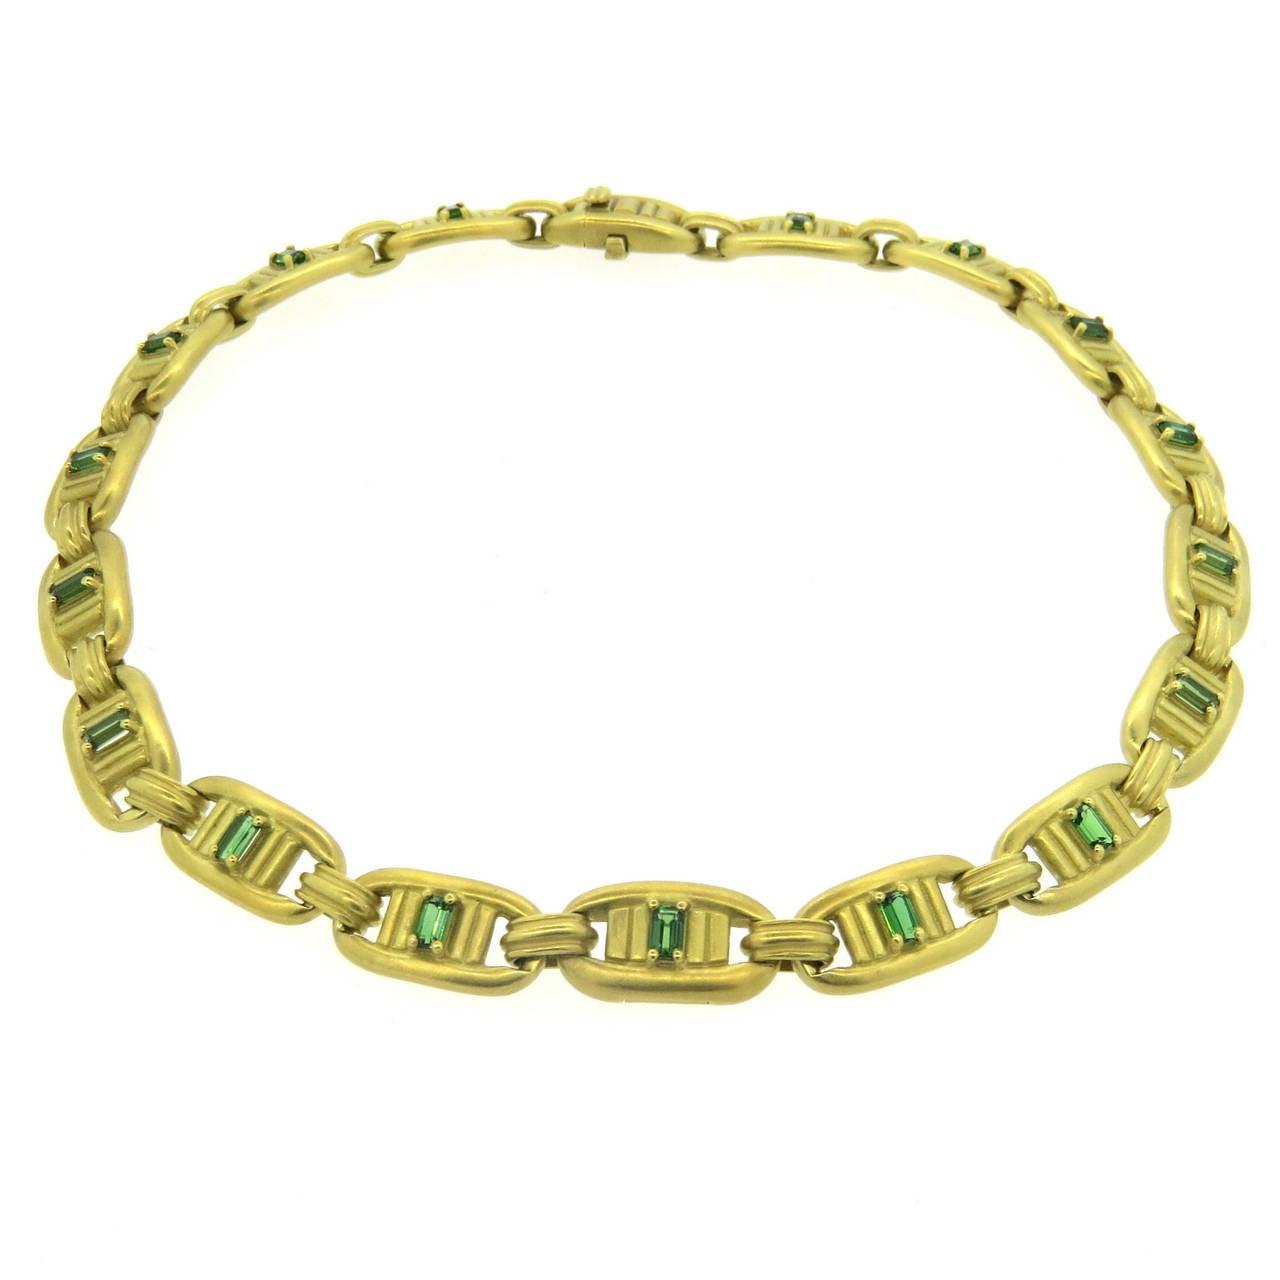 1980s Barry Kieselstein Cord Gold Green Tourmaline Necklace